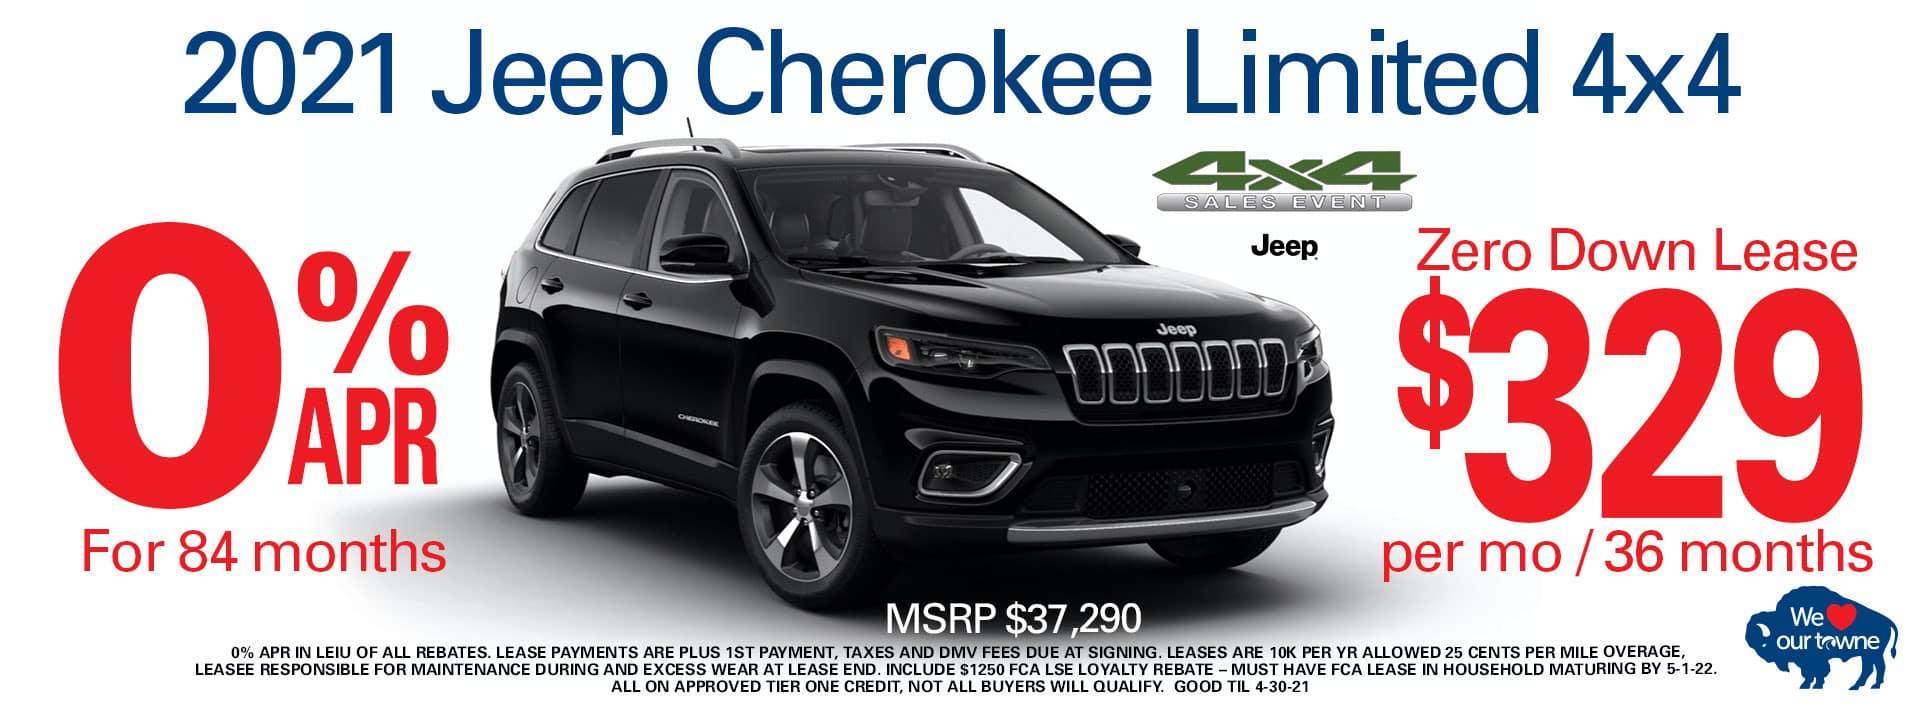 Cherokee_1920x705